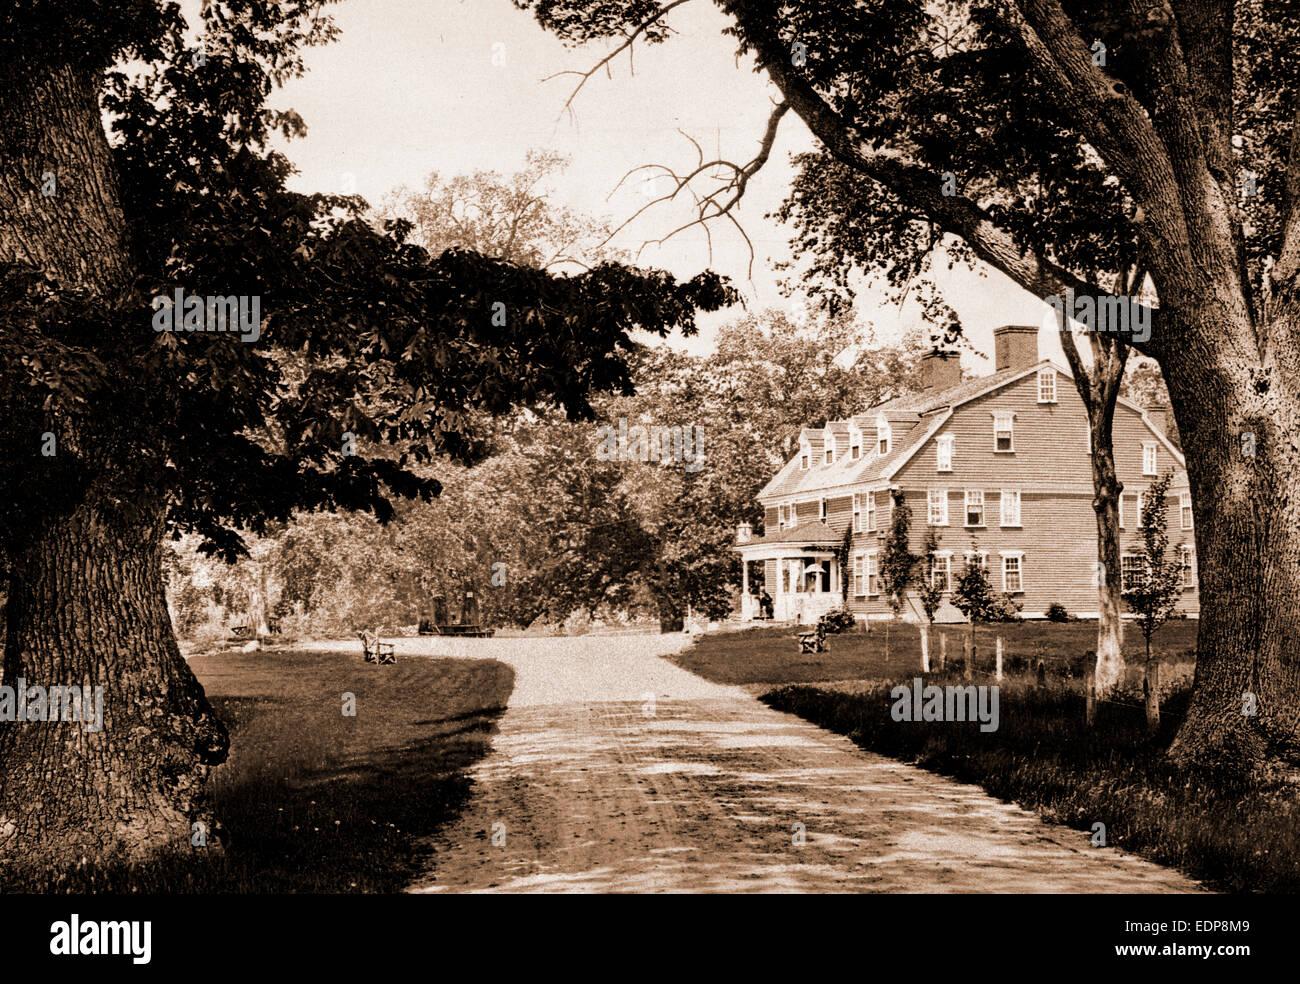 The Wayside Inn, Sudbury, Massachusetts, taverns (inns), United States, Massachusetts, Sudbury, 1900 - Stock Image